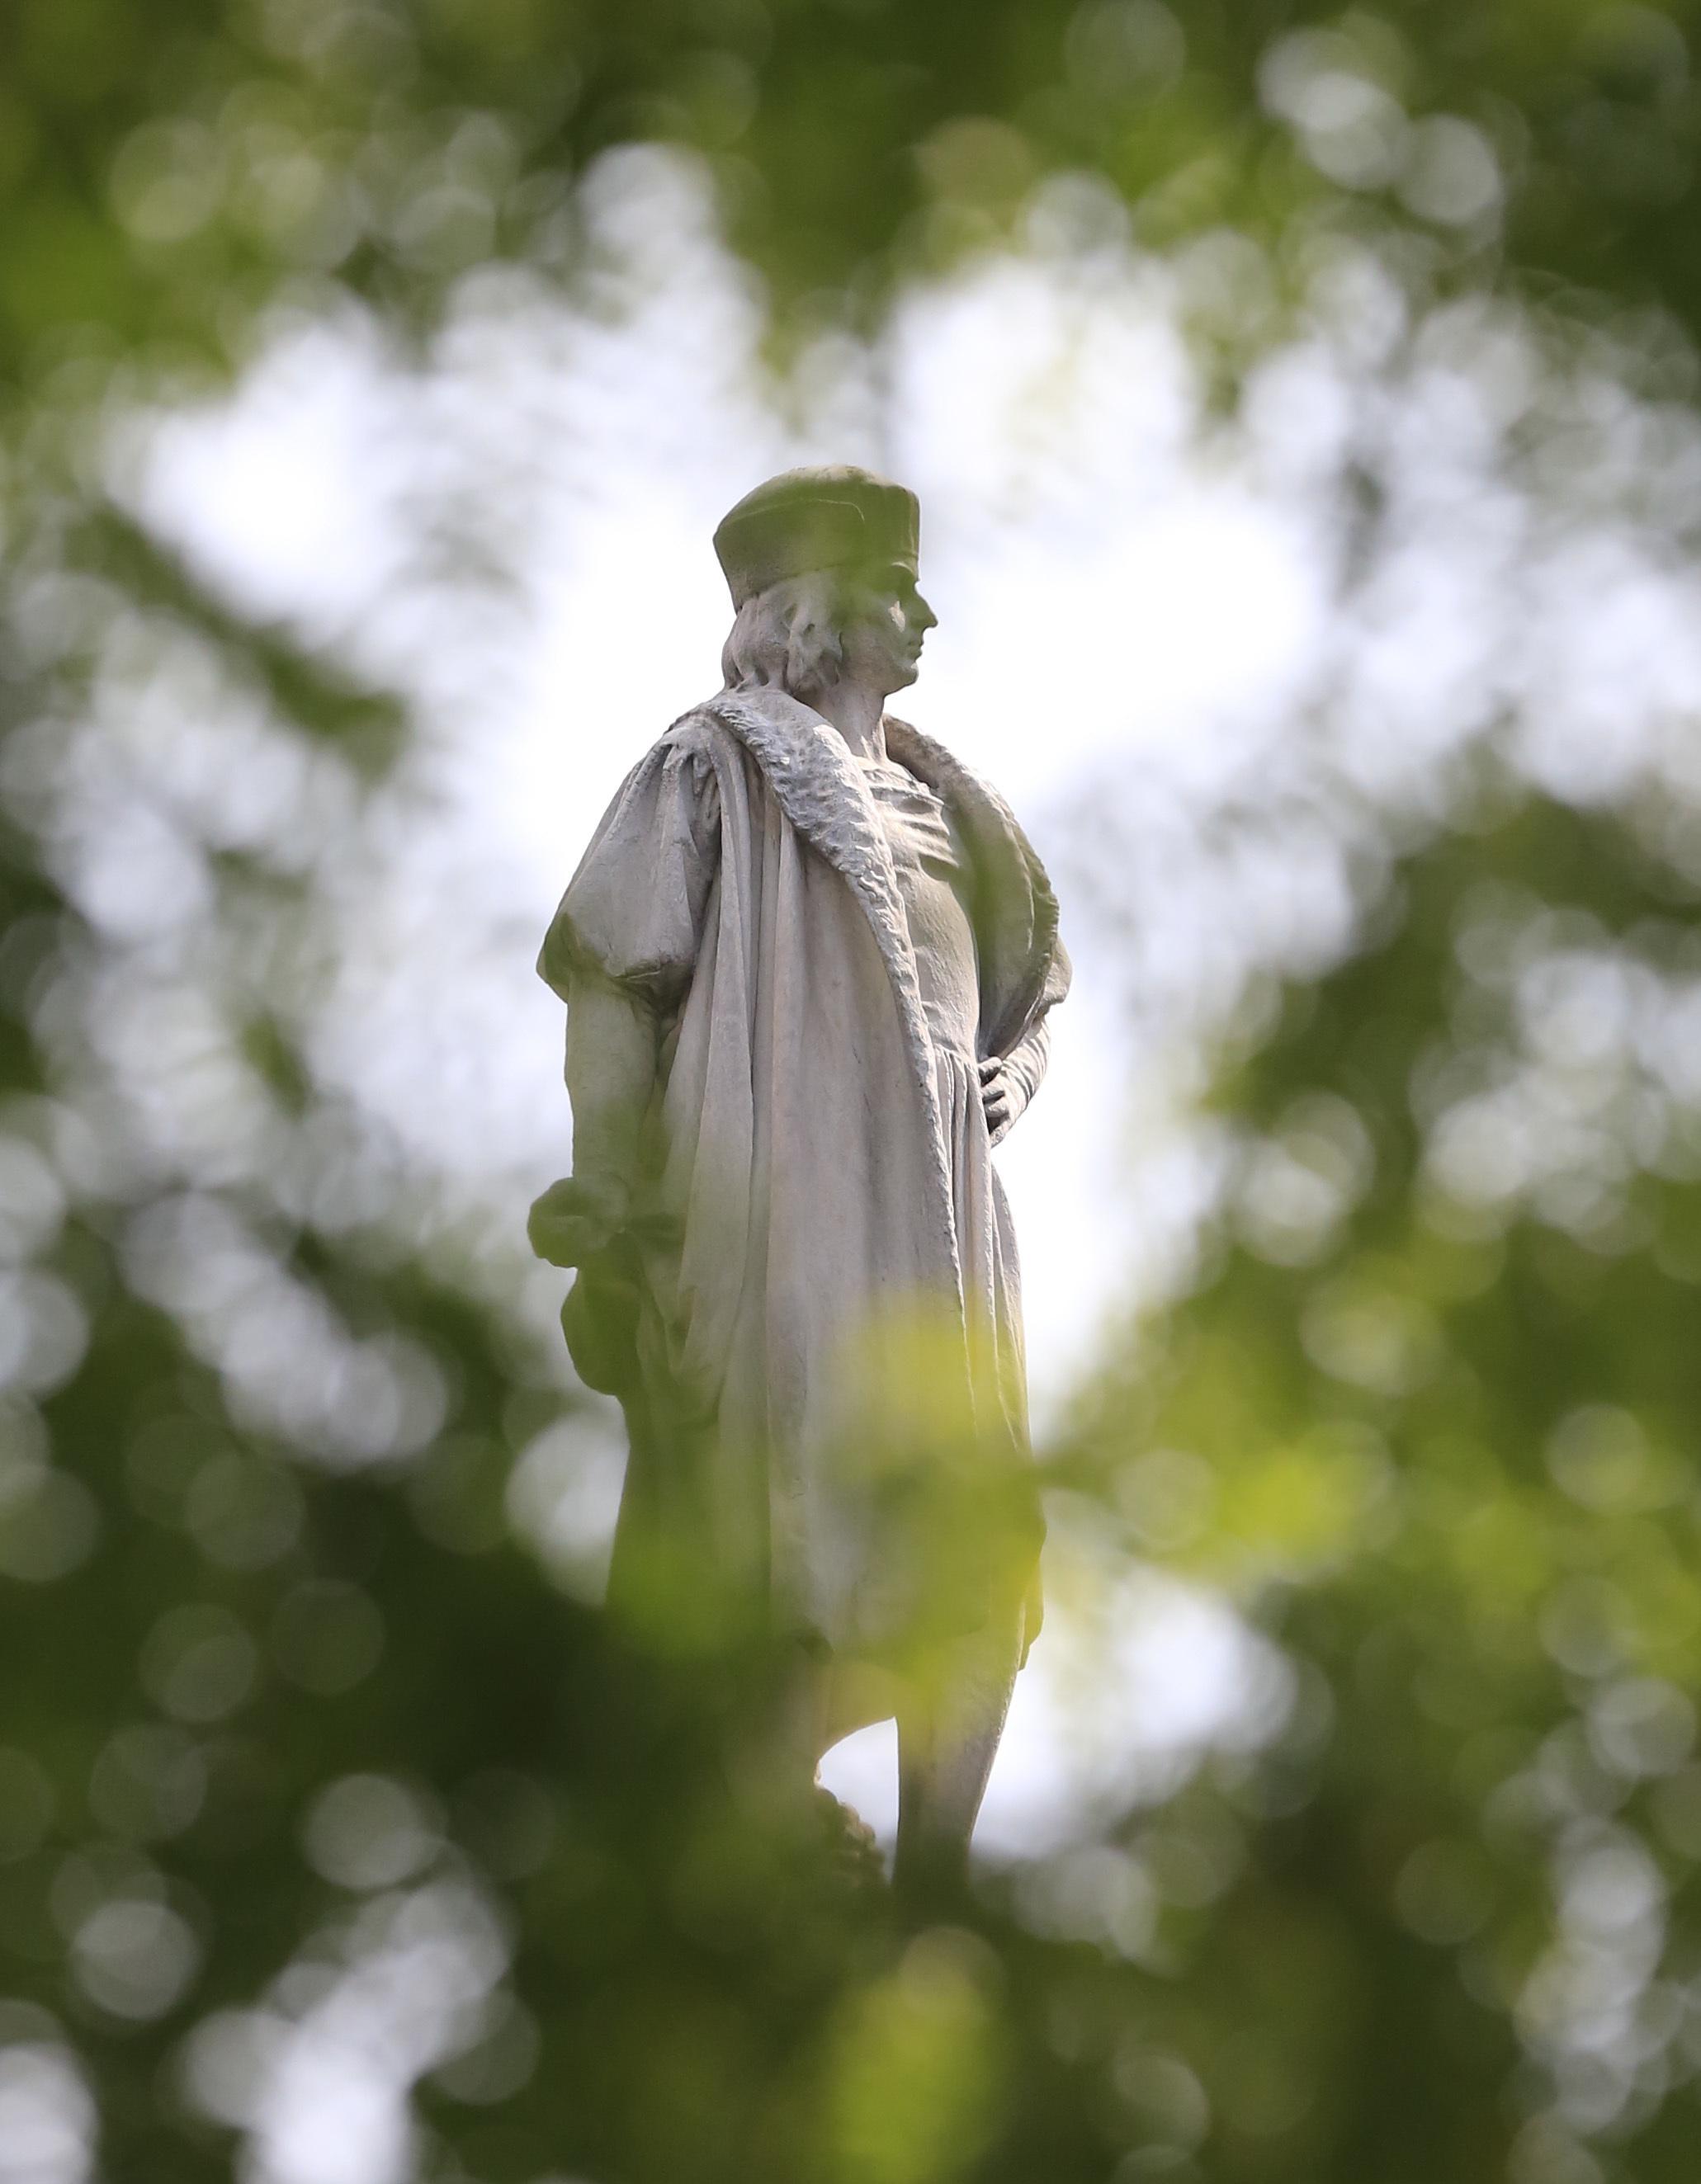 Estatua de Cristóbal Colón en Nueva York. Foto: Bebeto Matthews / AP